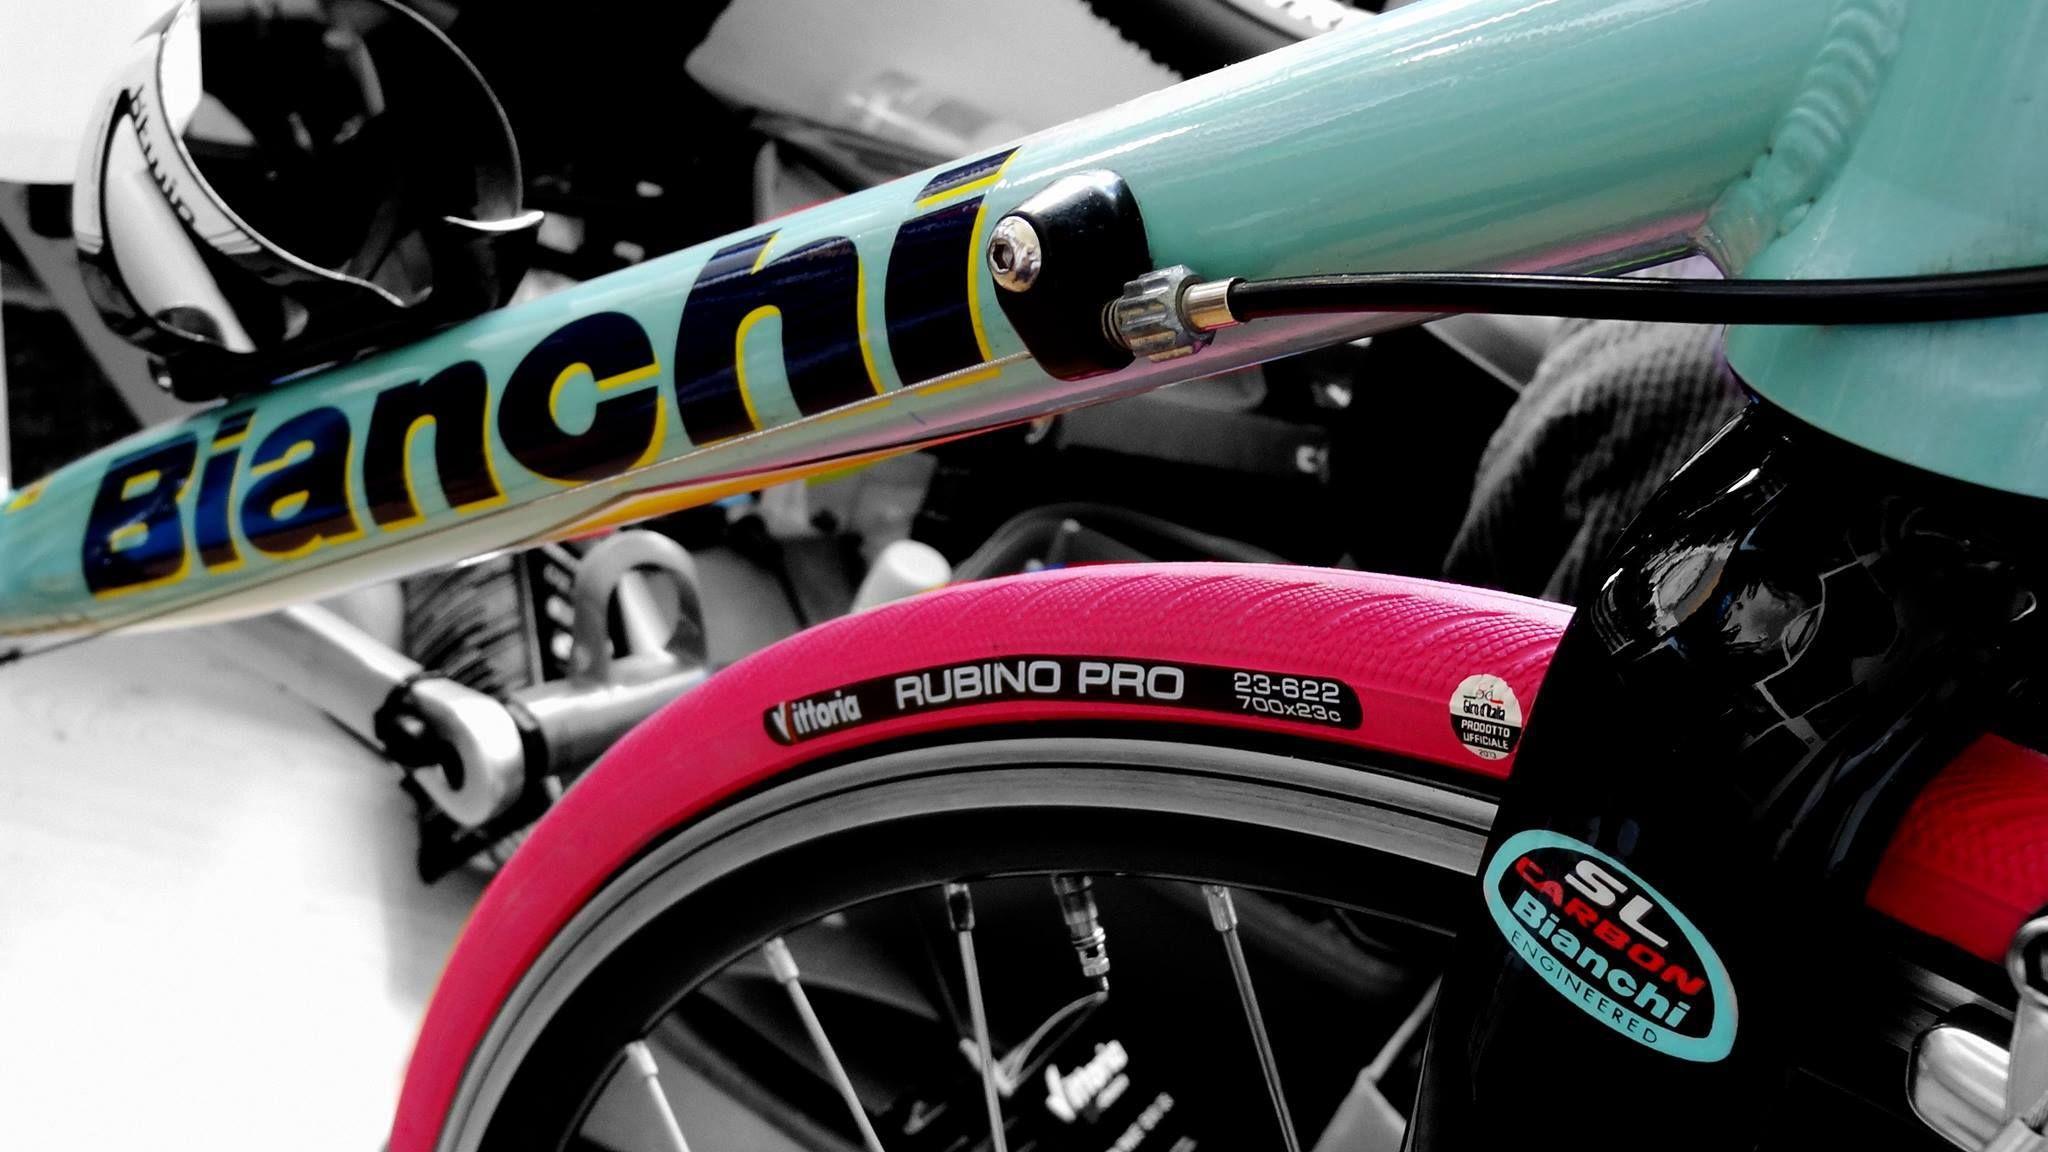 Vittoria Rubino Pro Pink Special Edition Giro d'Italia